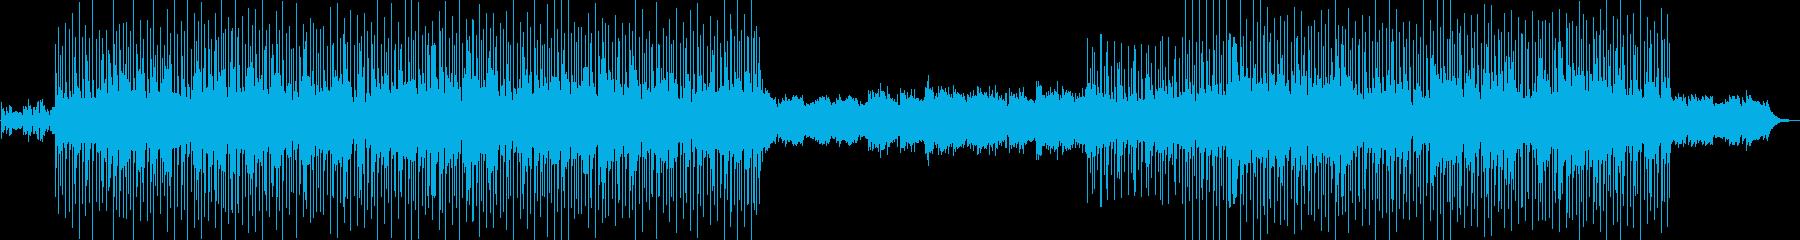 80's J-POP風の再生済みの波形